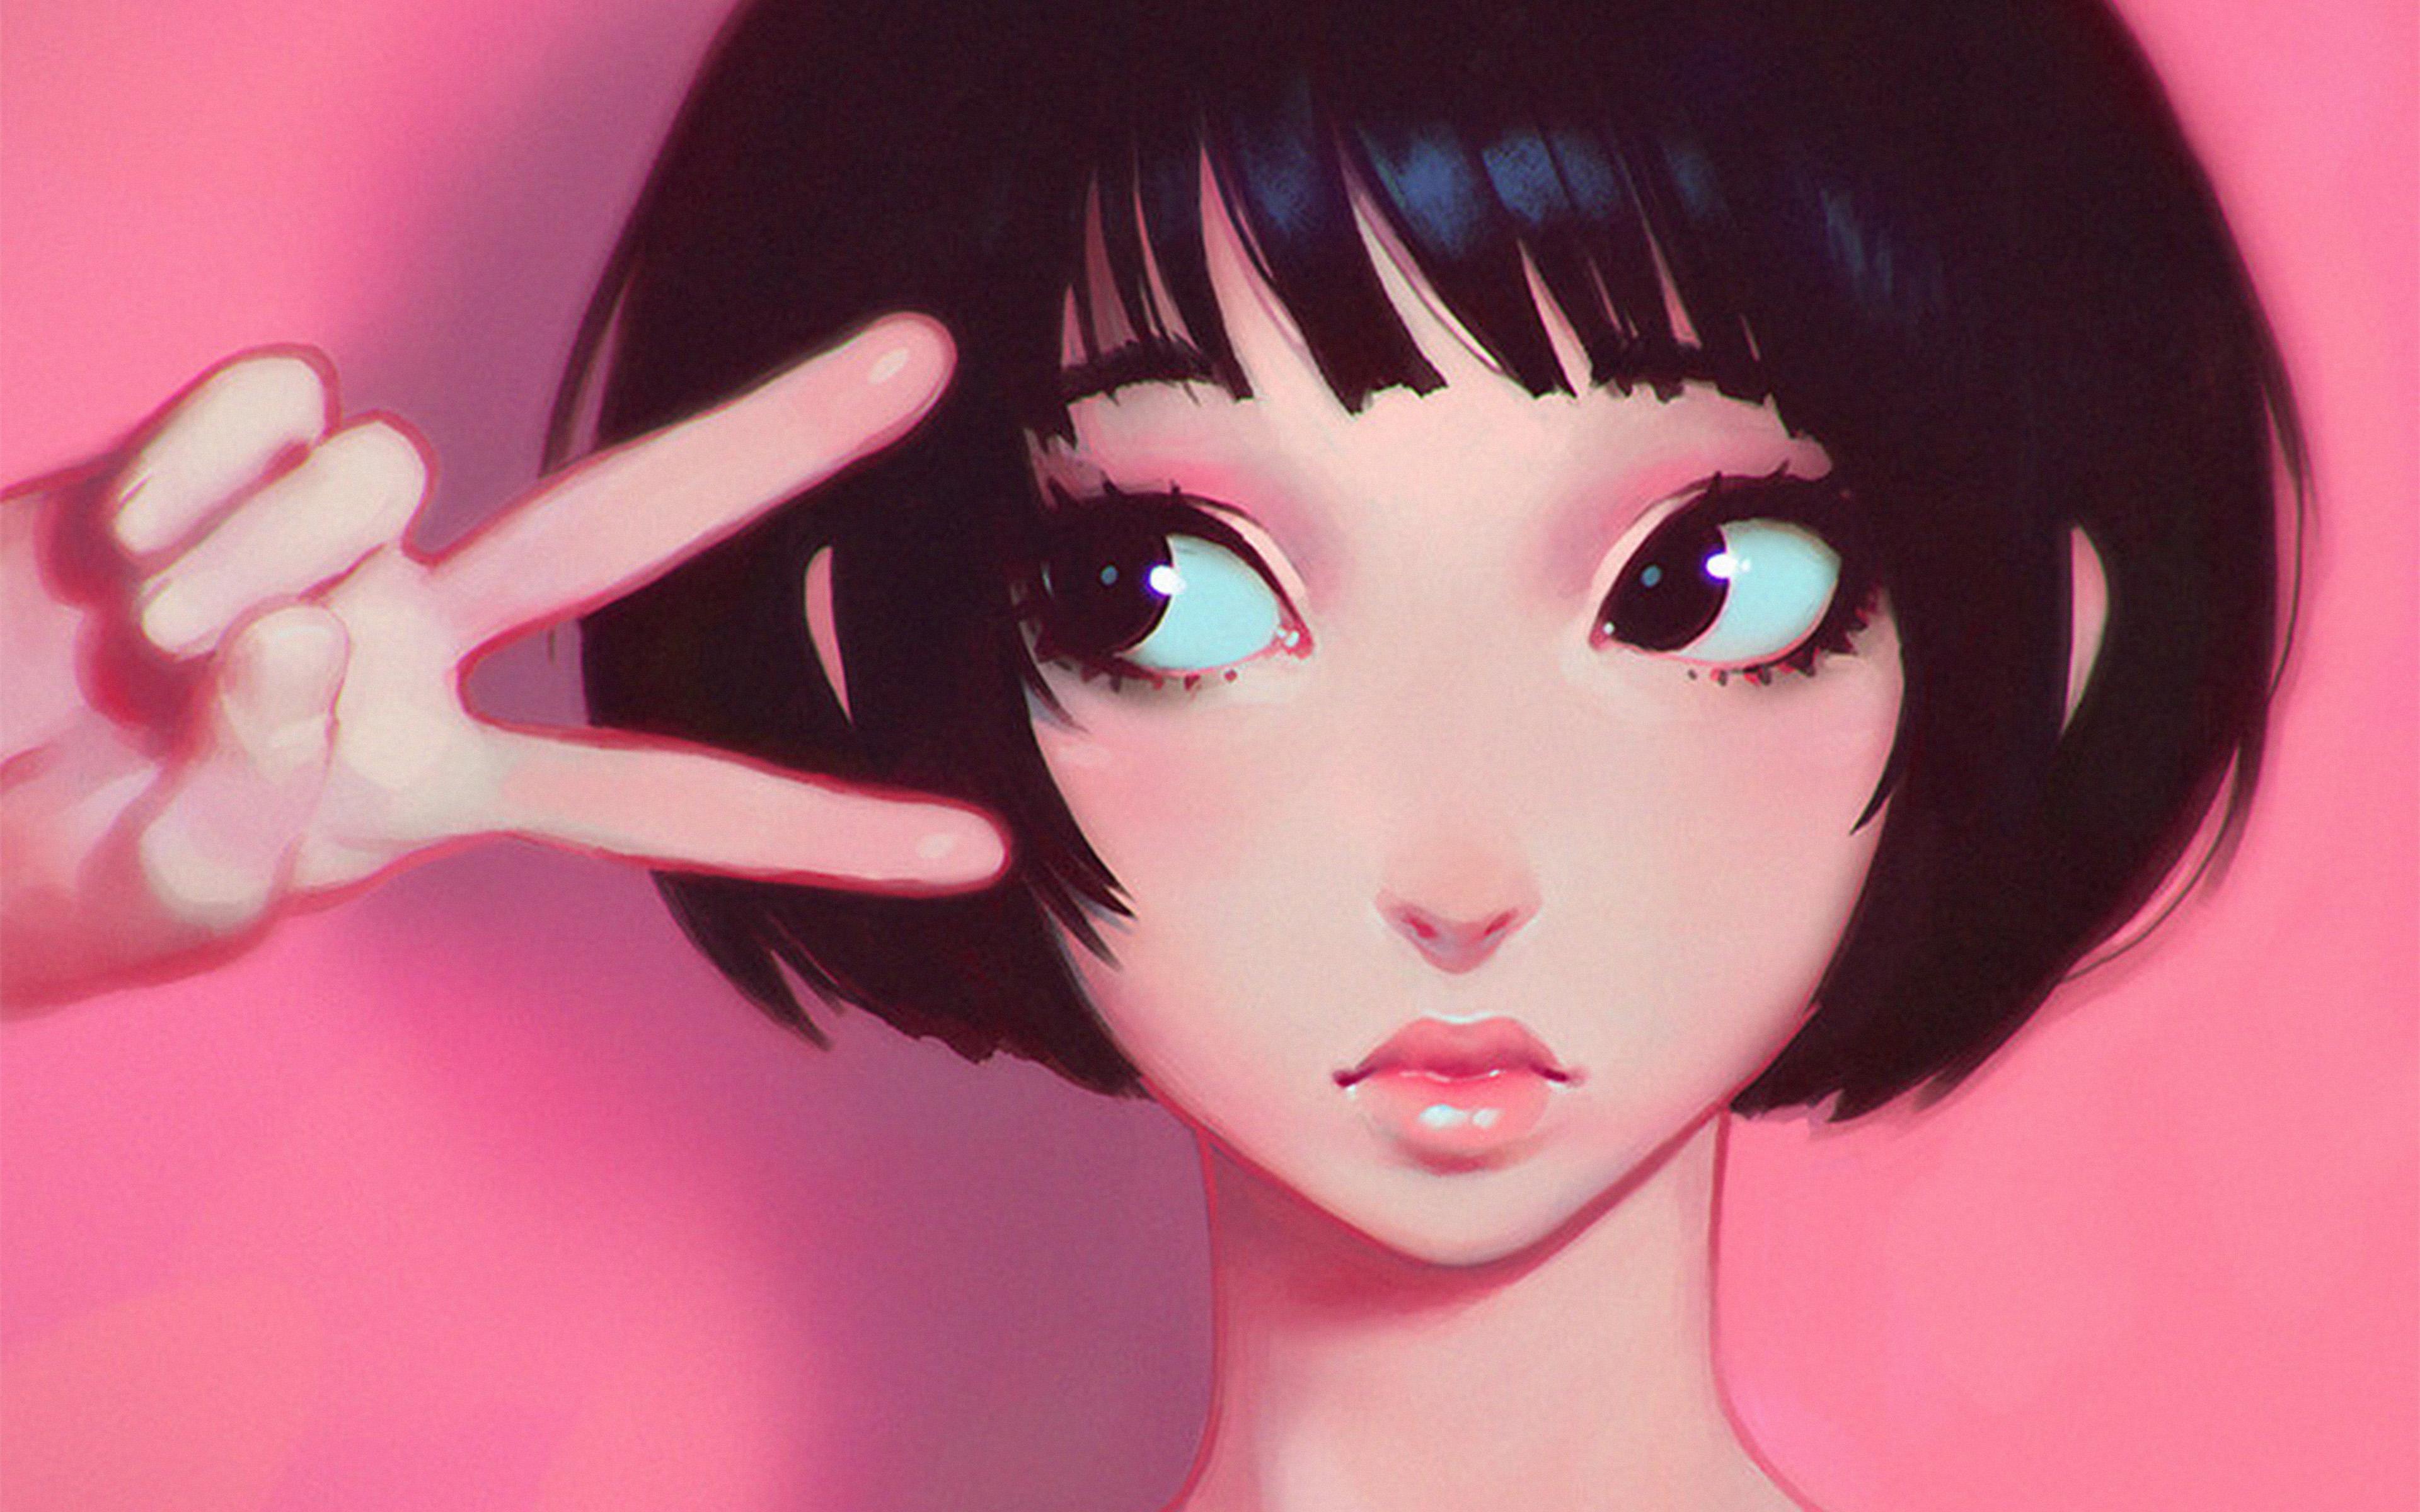 ay03-ilya-kuvshinov-pink-girl-illustration-art-wallpaper